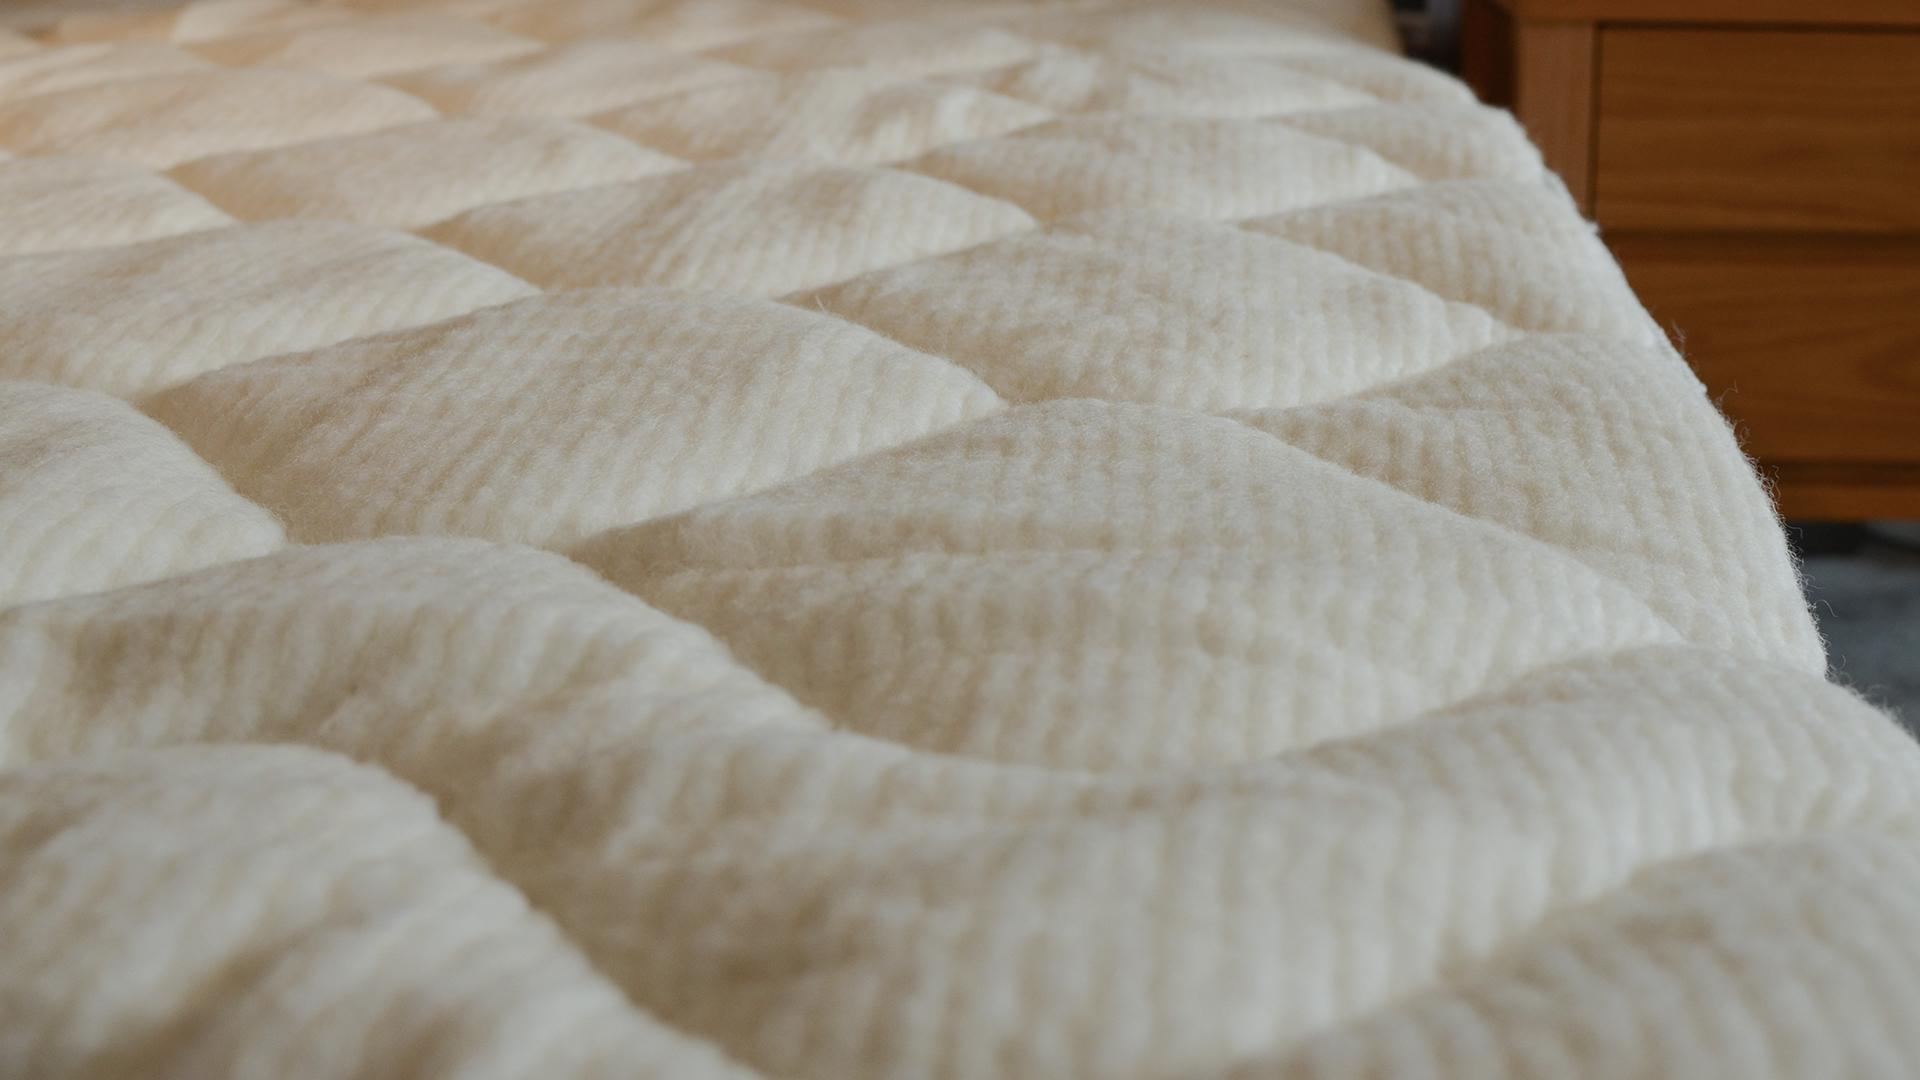 reversible coolmax mattress topper - wool side